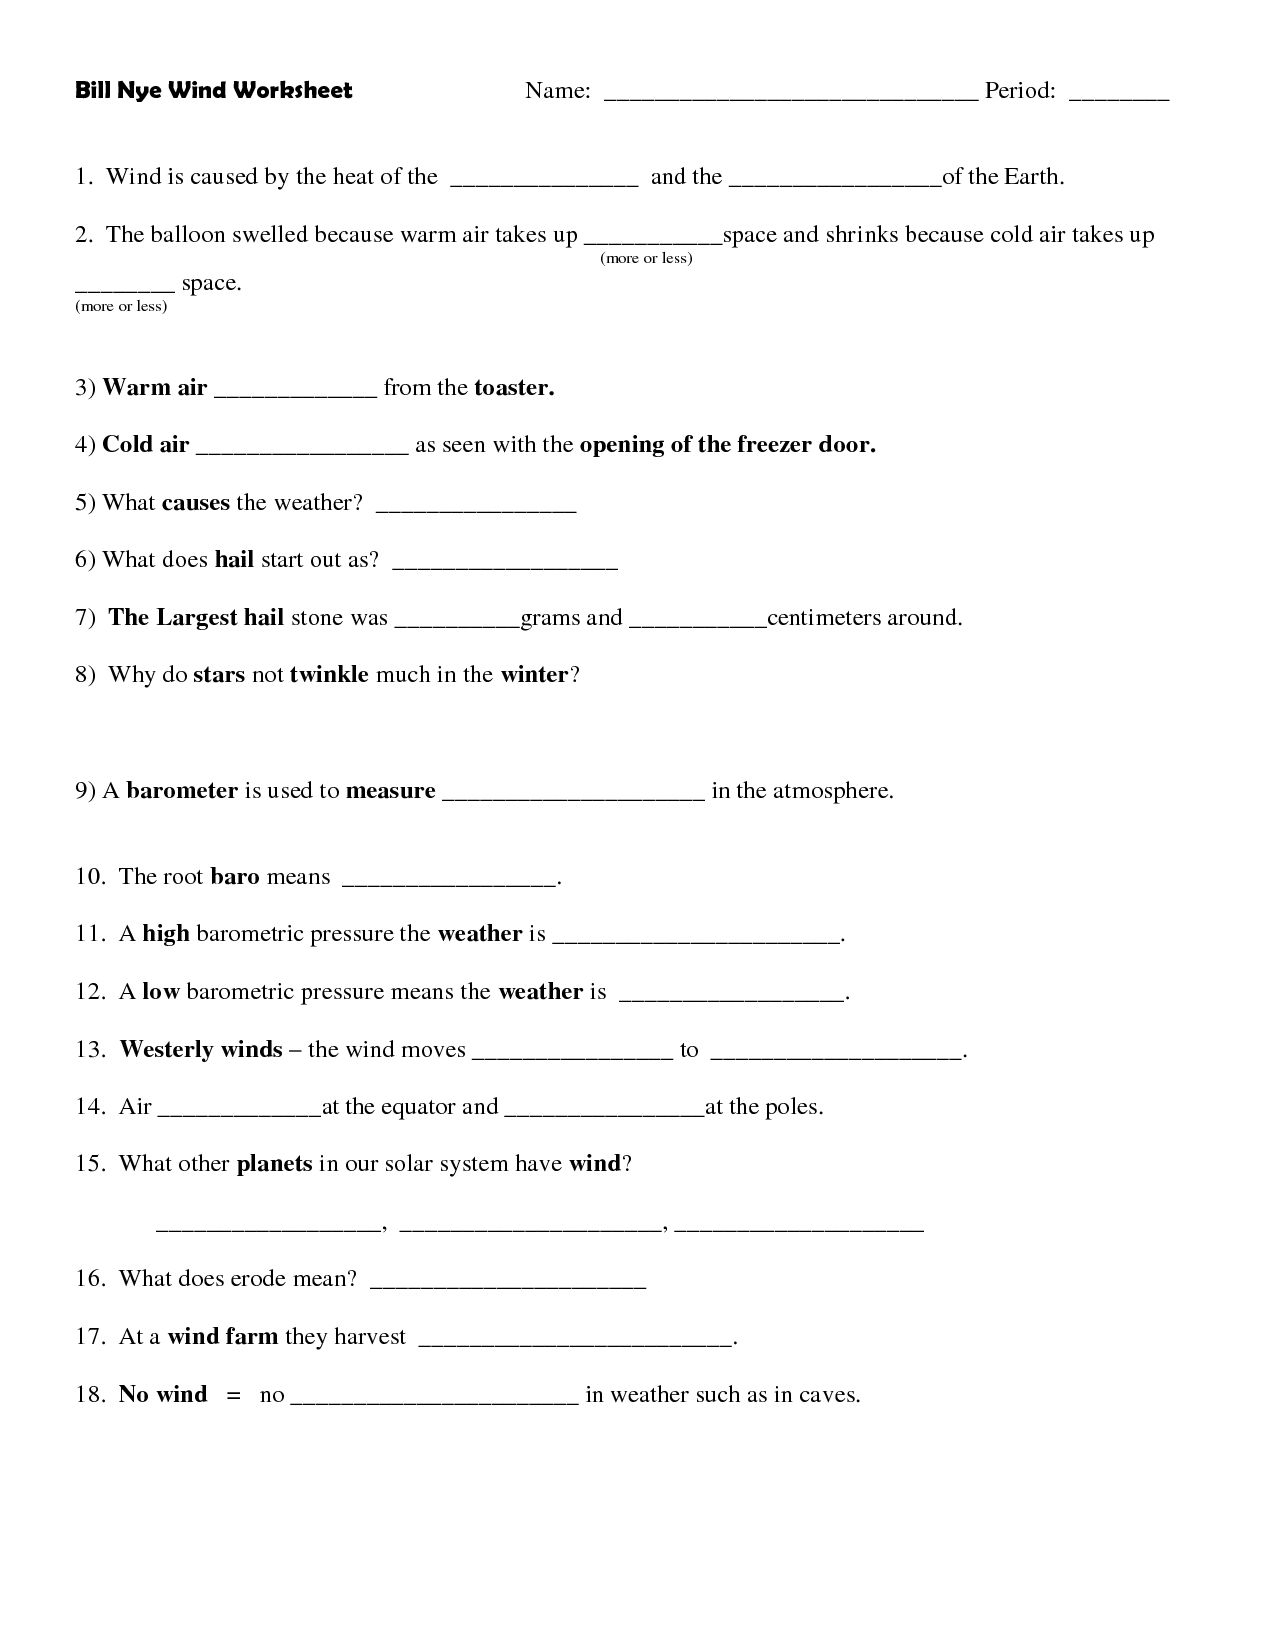 Bill Nye Plants Worksheet Answers